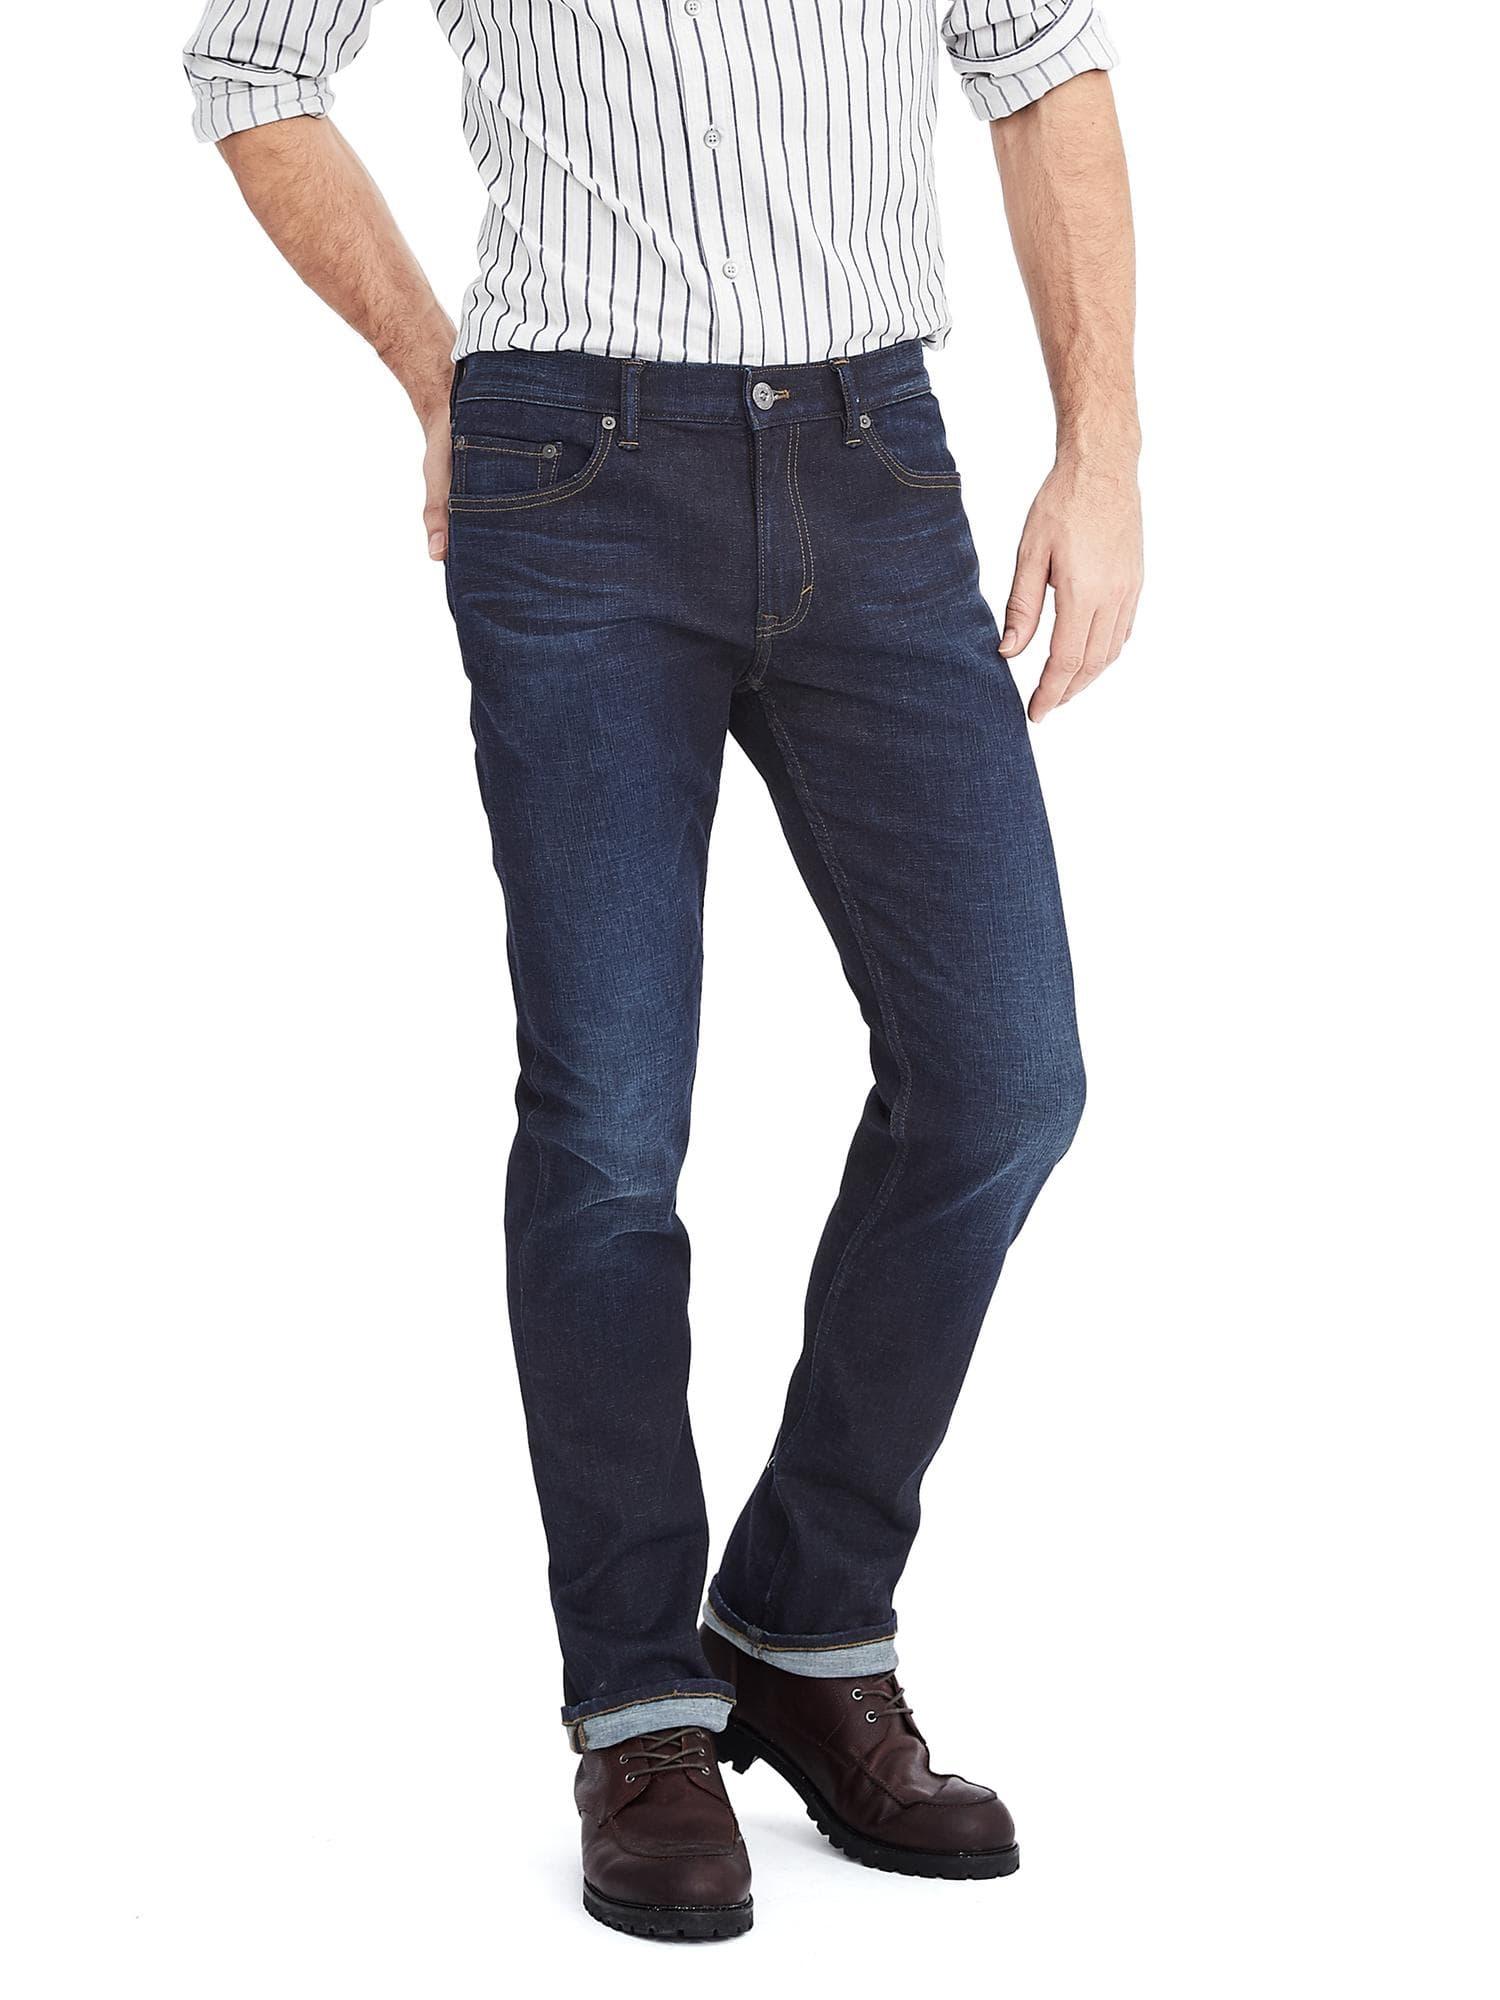 Banana Republic Slim Rapid Movement Dark Wash Jeans $46.50